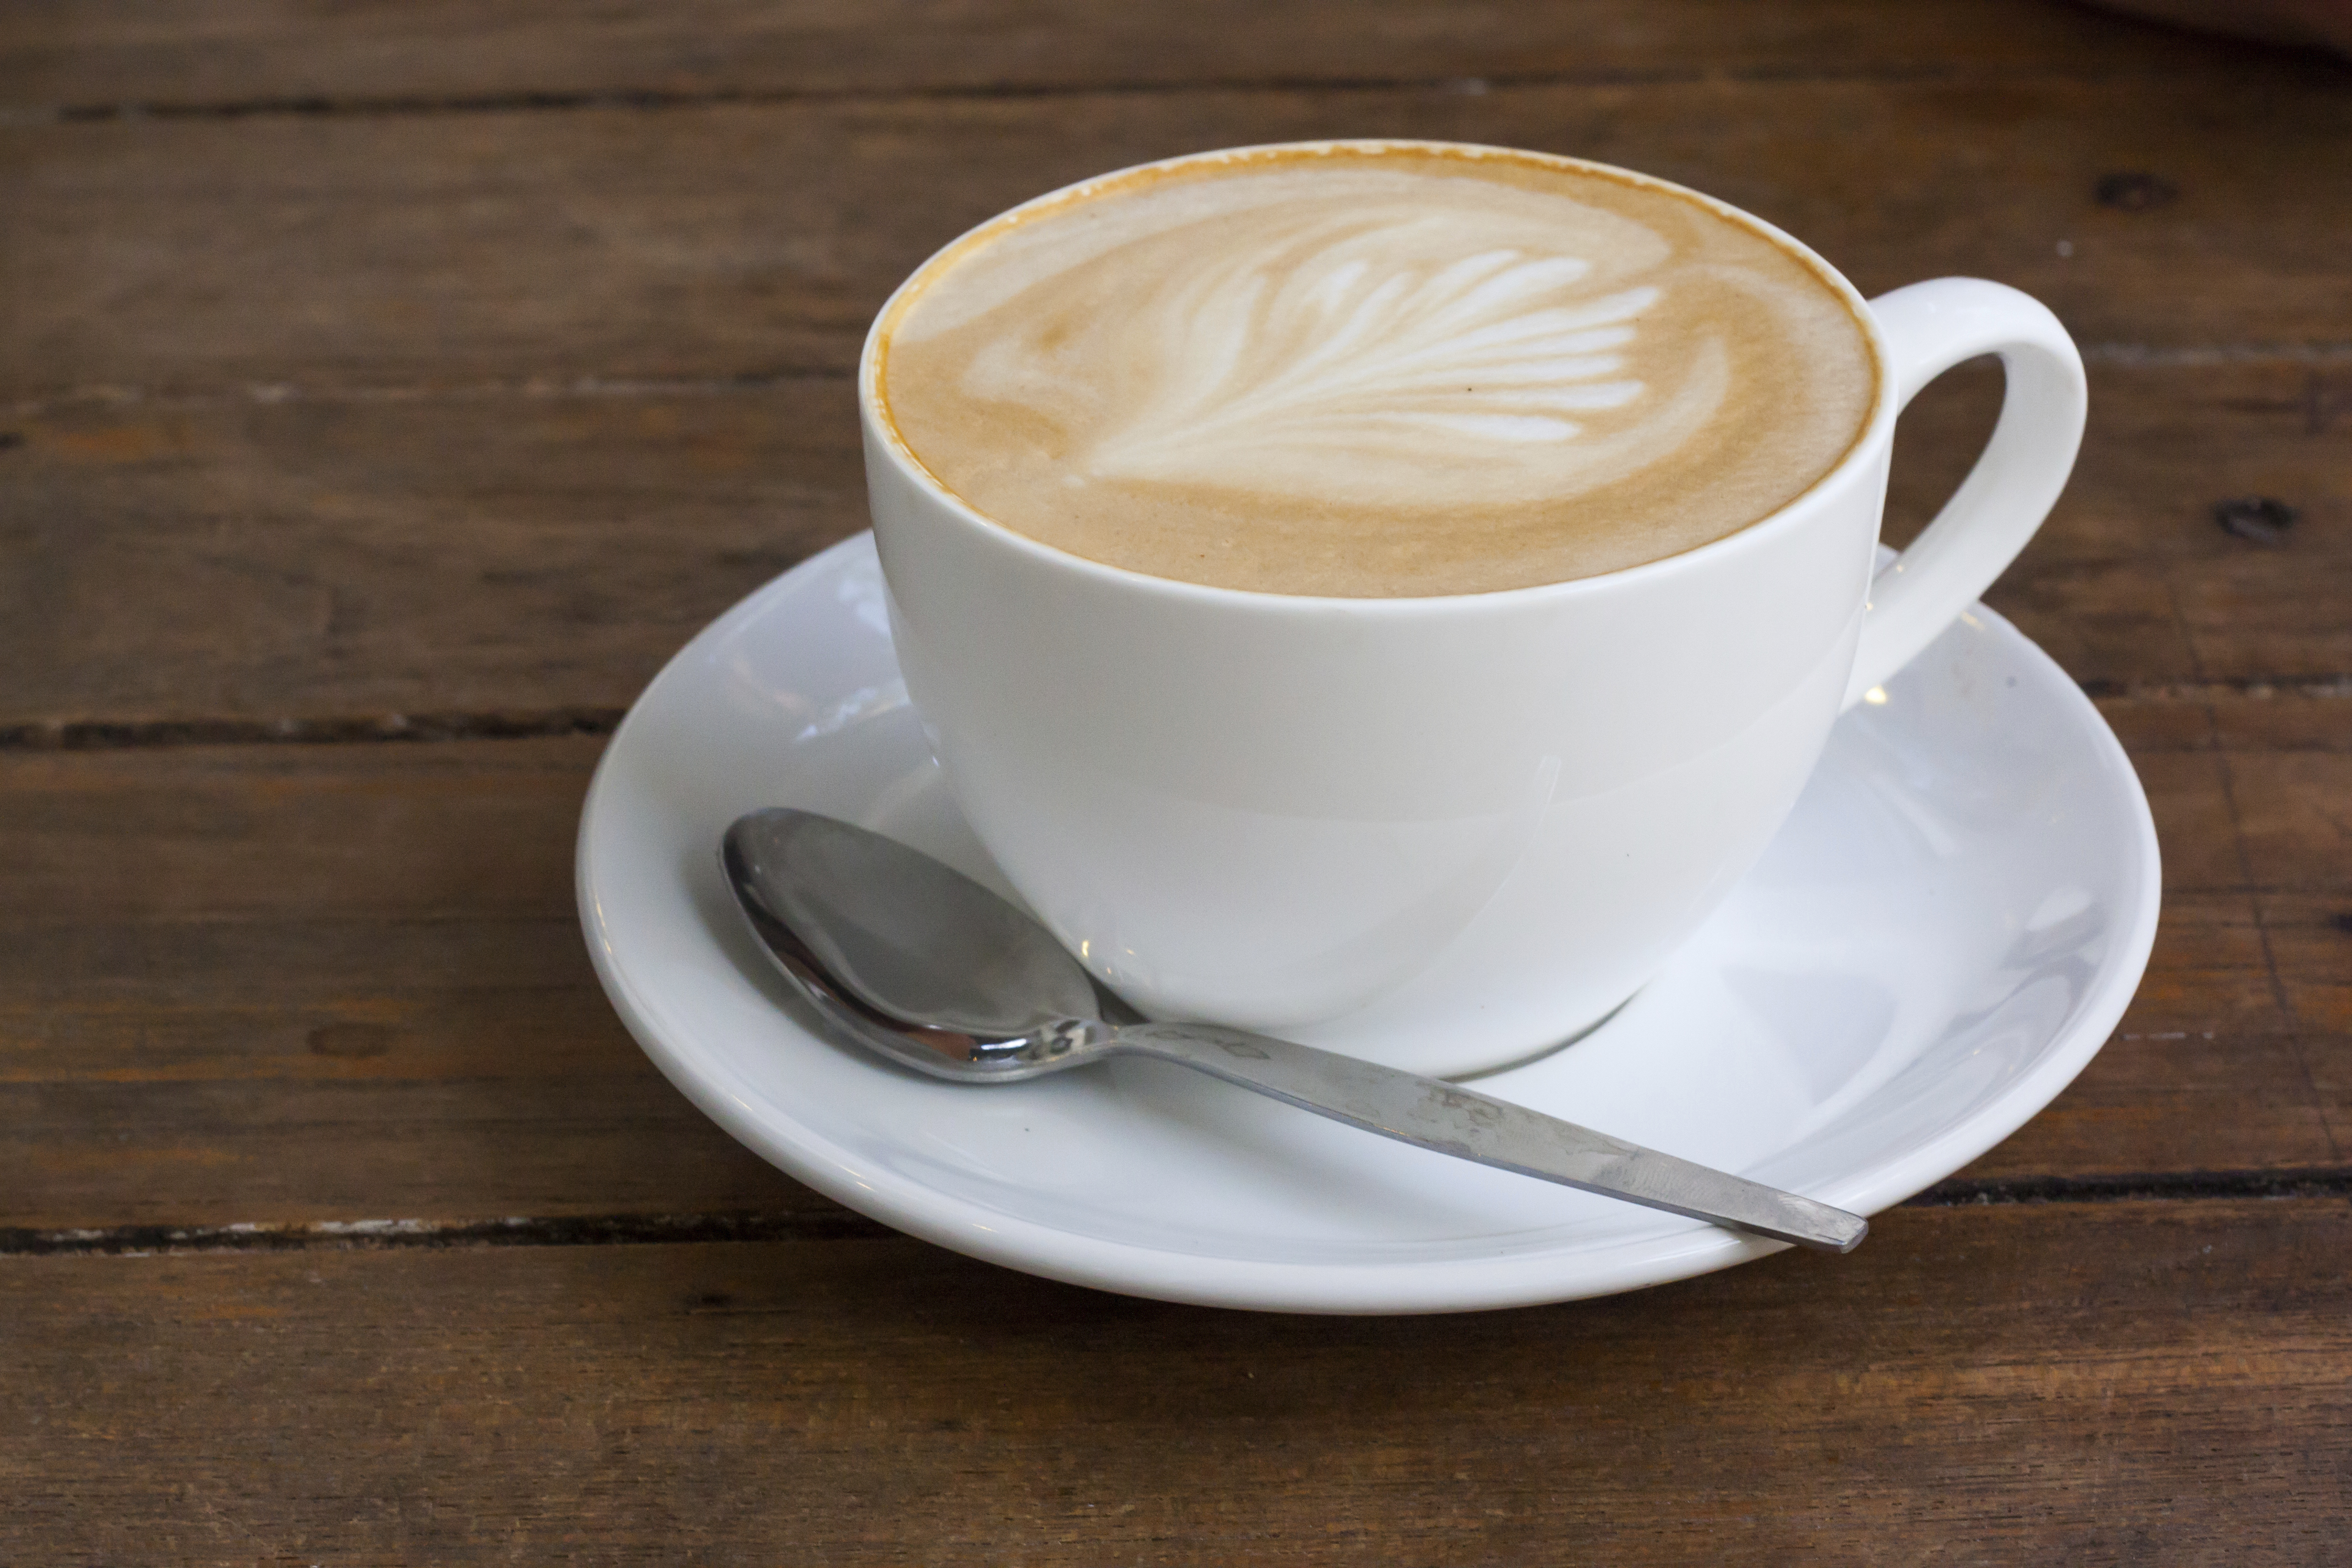 http://www.aesu.com/wp-content/uploads/2014/06/coffee.jpg